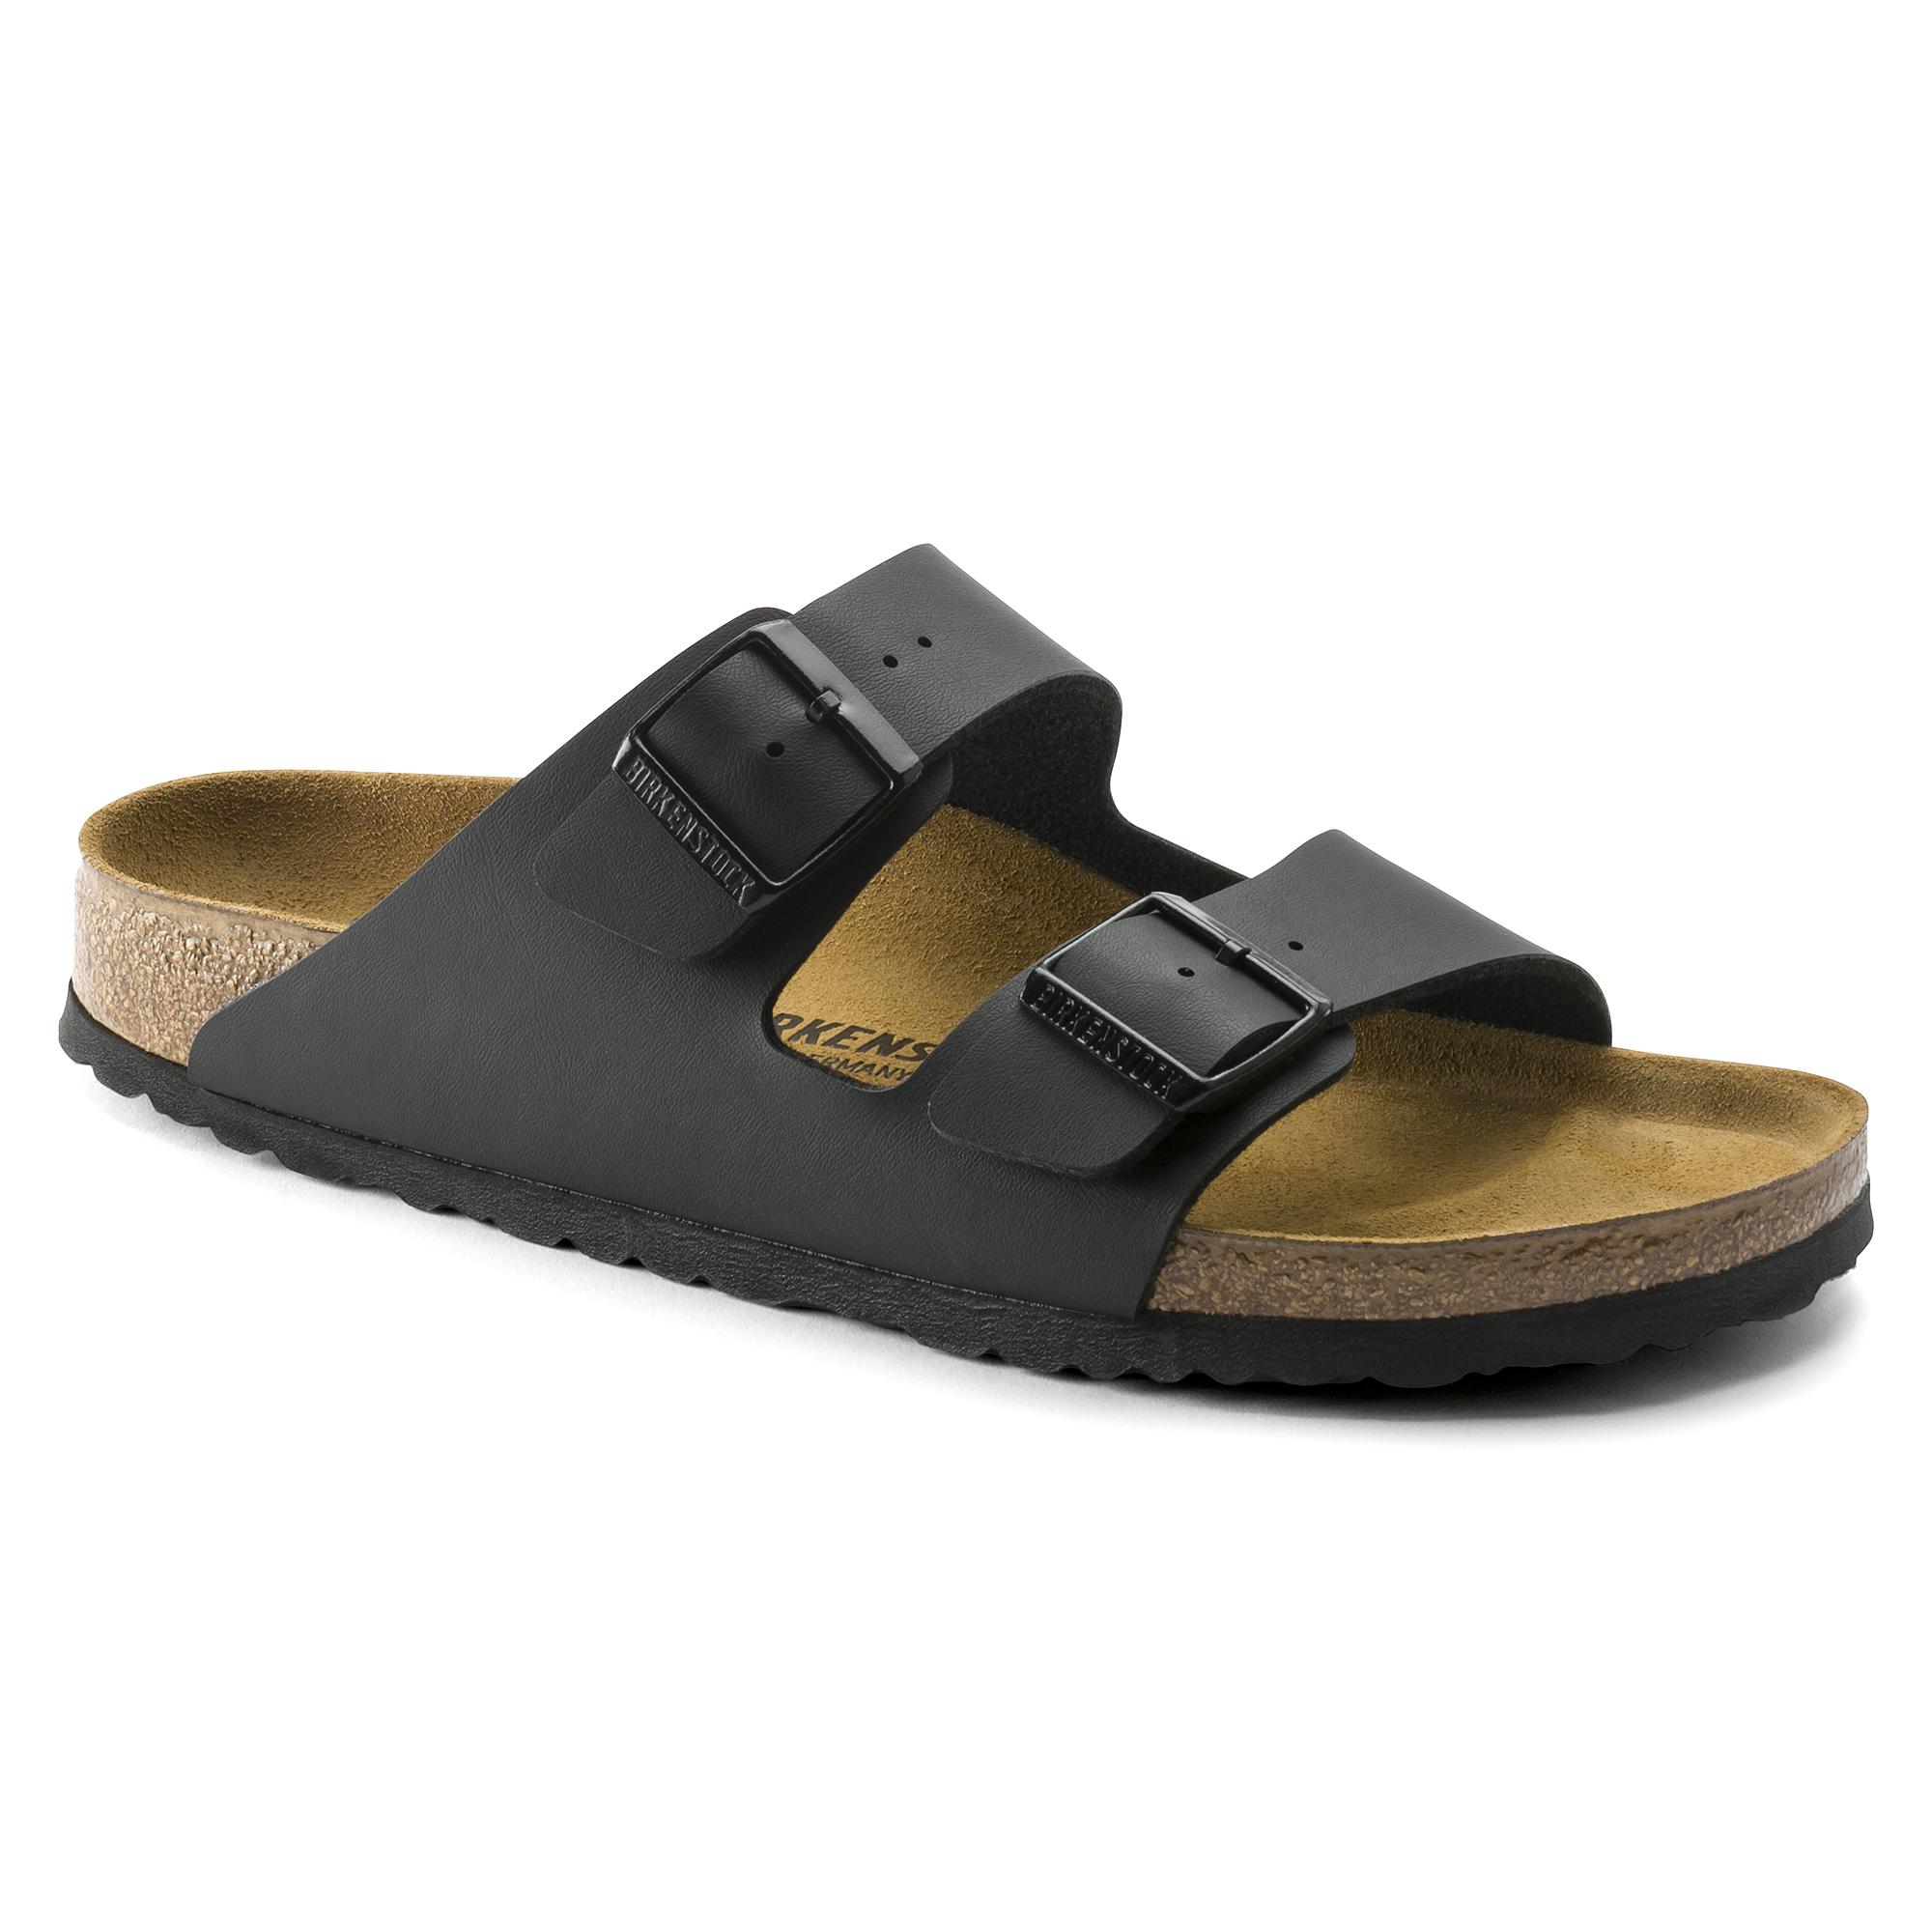 Arizona Birko Flor | Two strap sandals, Birkenstock, Arizona